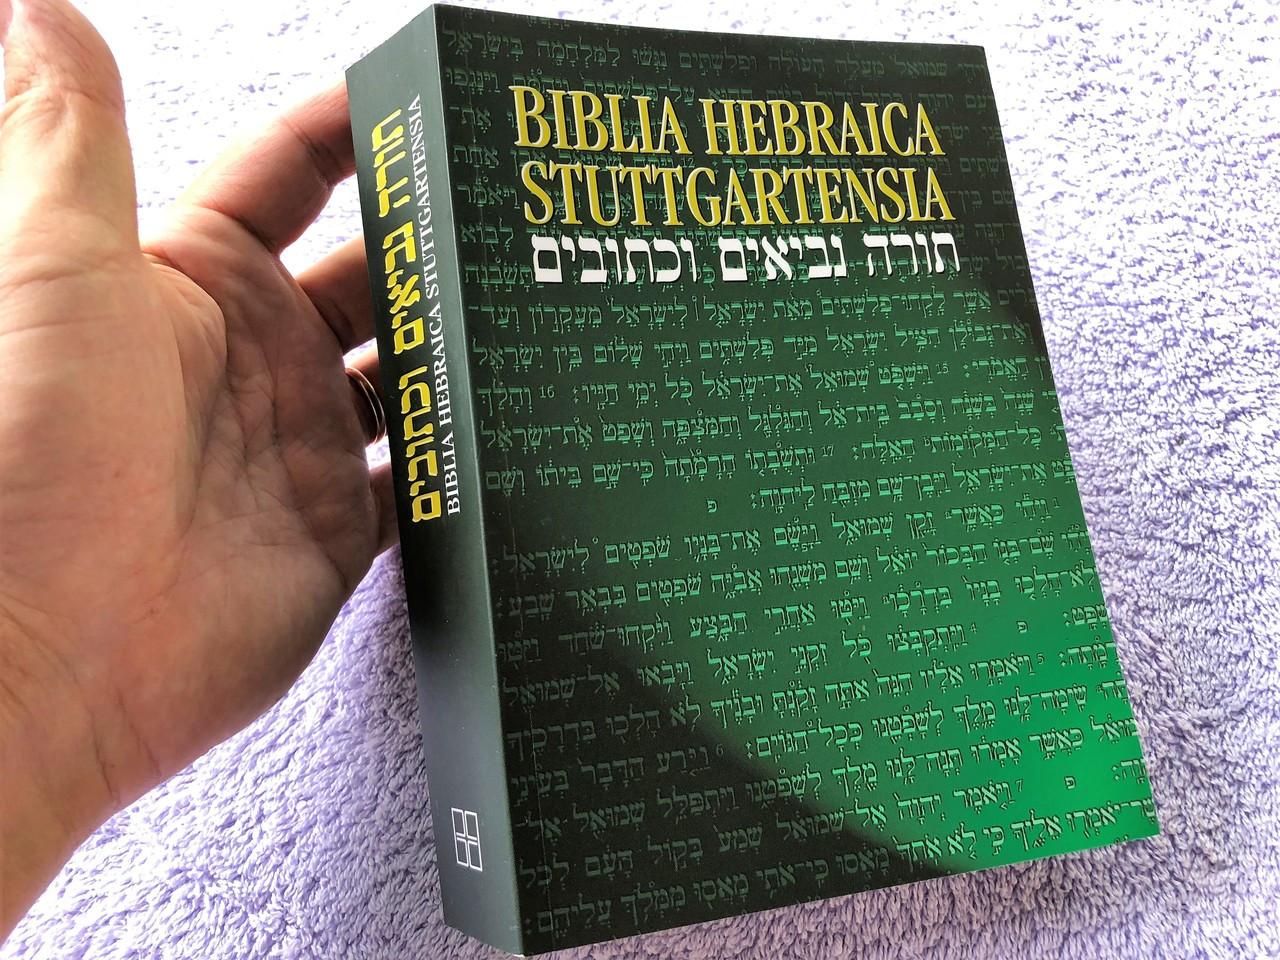 Hebrew Old Testament Biblia Hebraica Stuttgartensia 5th edition, 1997 / The  complete small Masora is printed in the margin